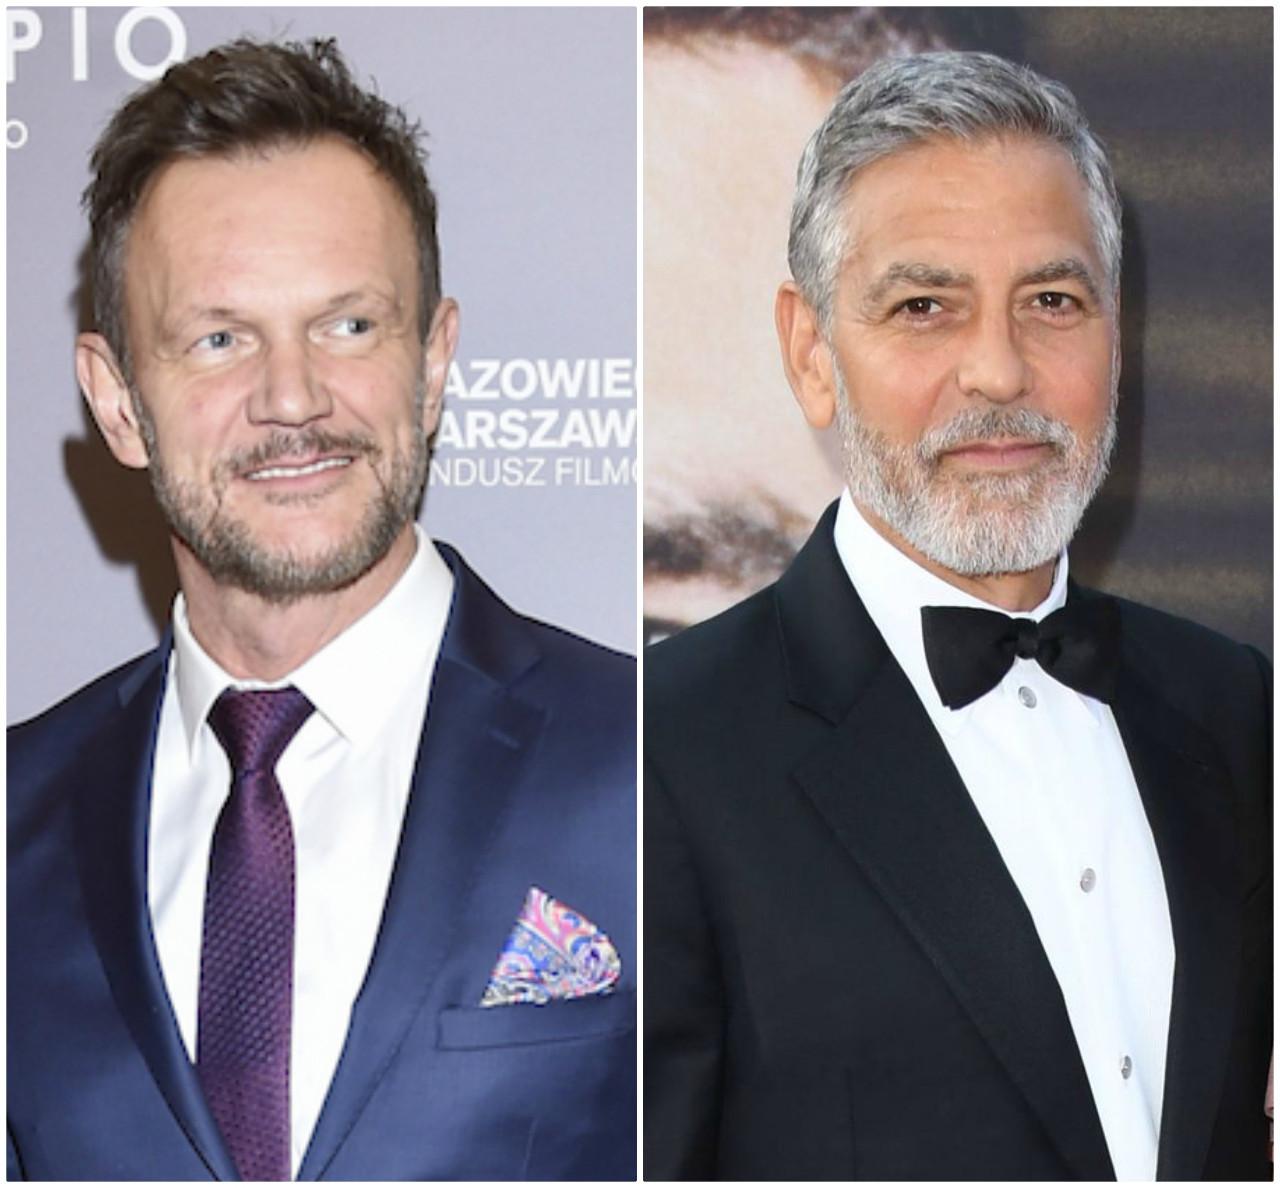 Cezary Pazura, George Clooney mają tyle samo lat.